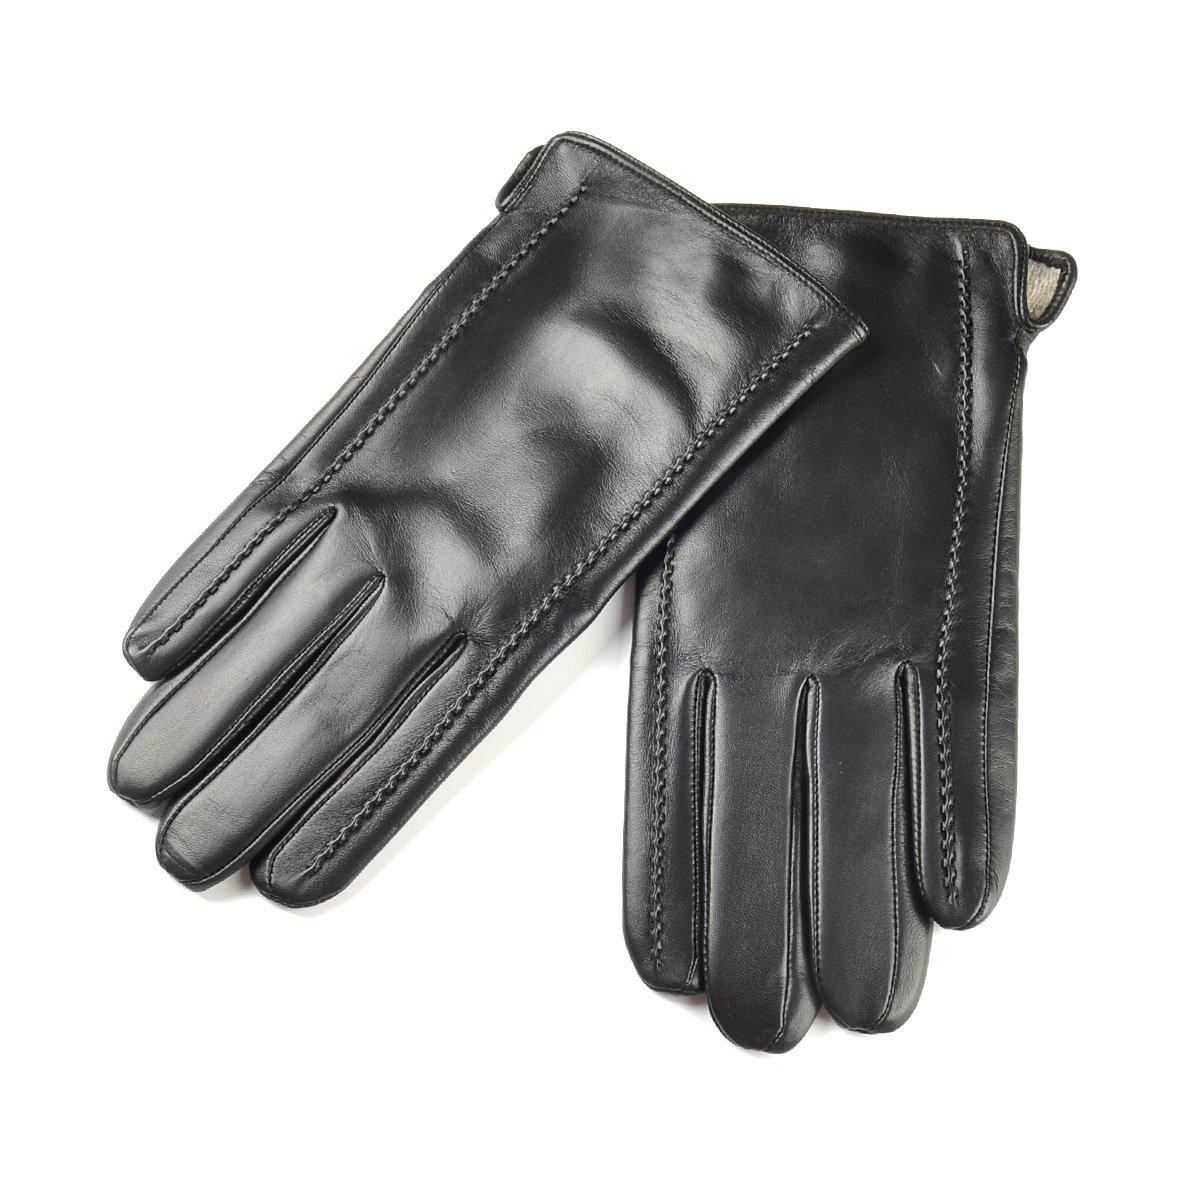 SIEFERSN Simple Design Men's Lambskin Full Touchscreen Gloves Winter Warm Leather Gloves 1154225012 (Large 9'', Black (Full Touchscreen/Soft flannel Lining))